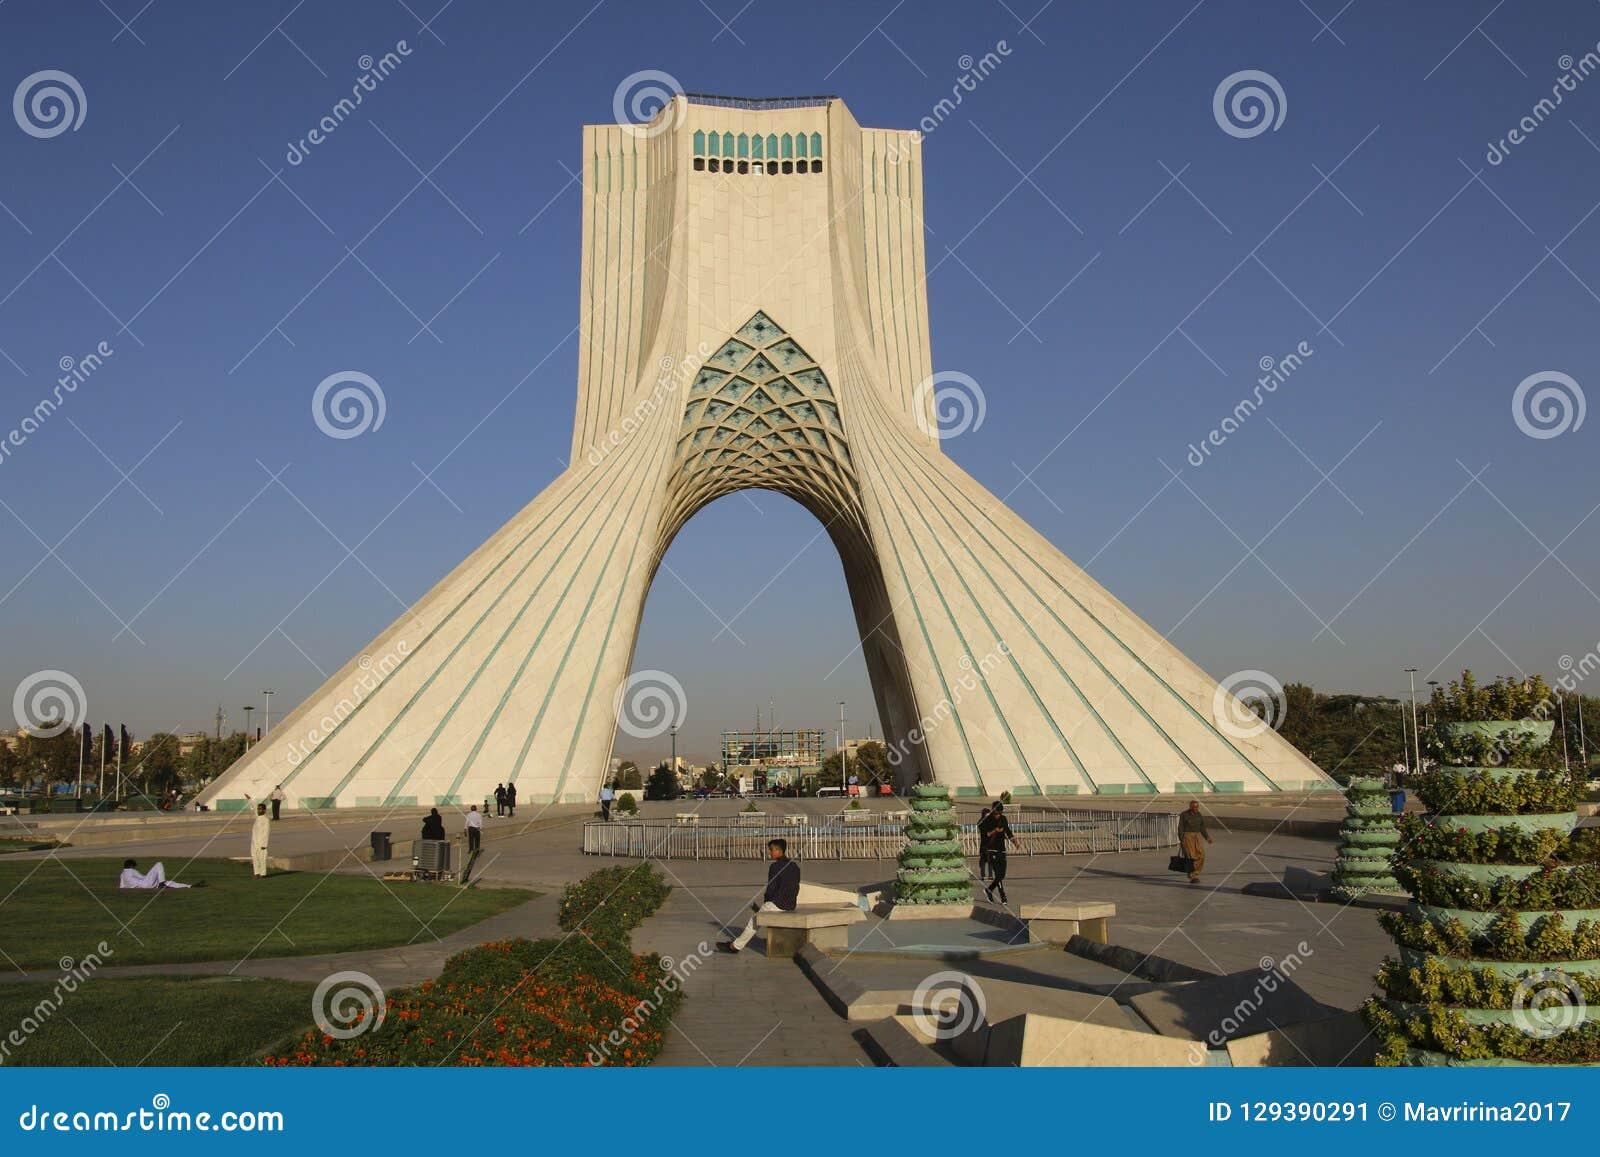 TEHRAN, IRAN - SEPTEMBER 17, 2018: Azadi Tower known as the Shah